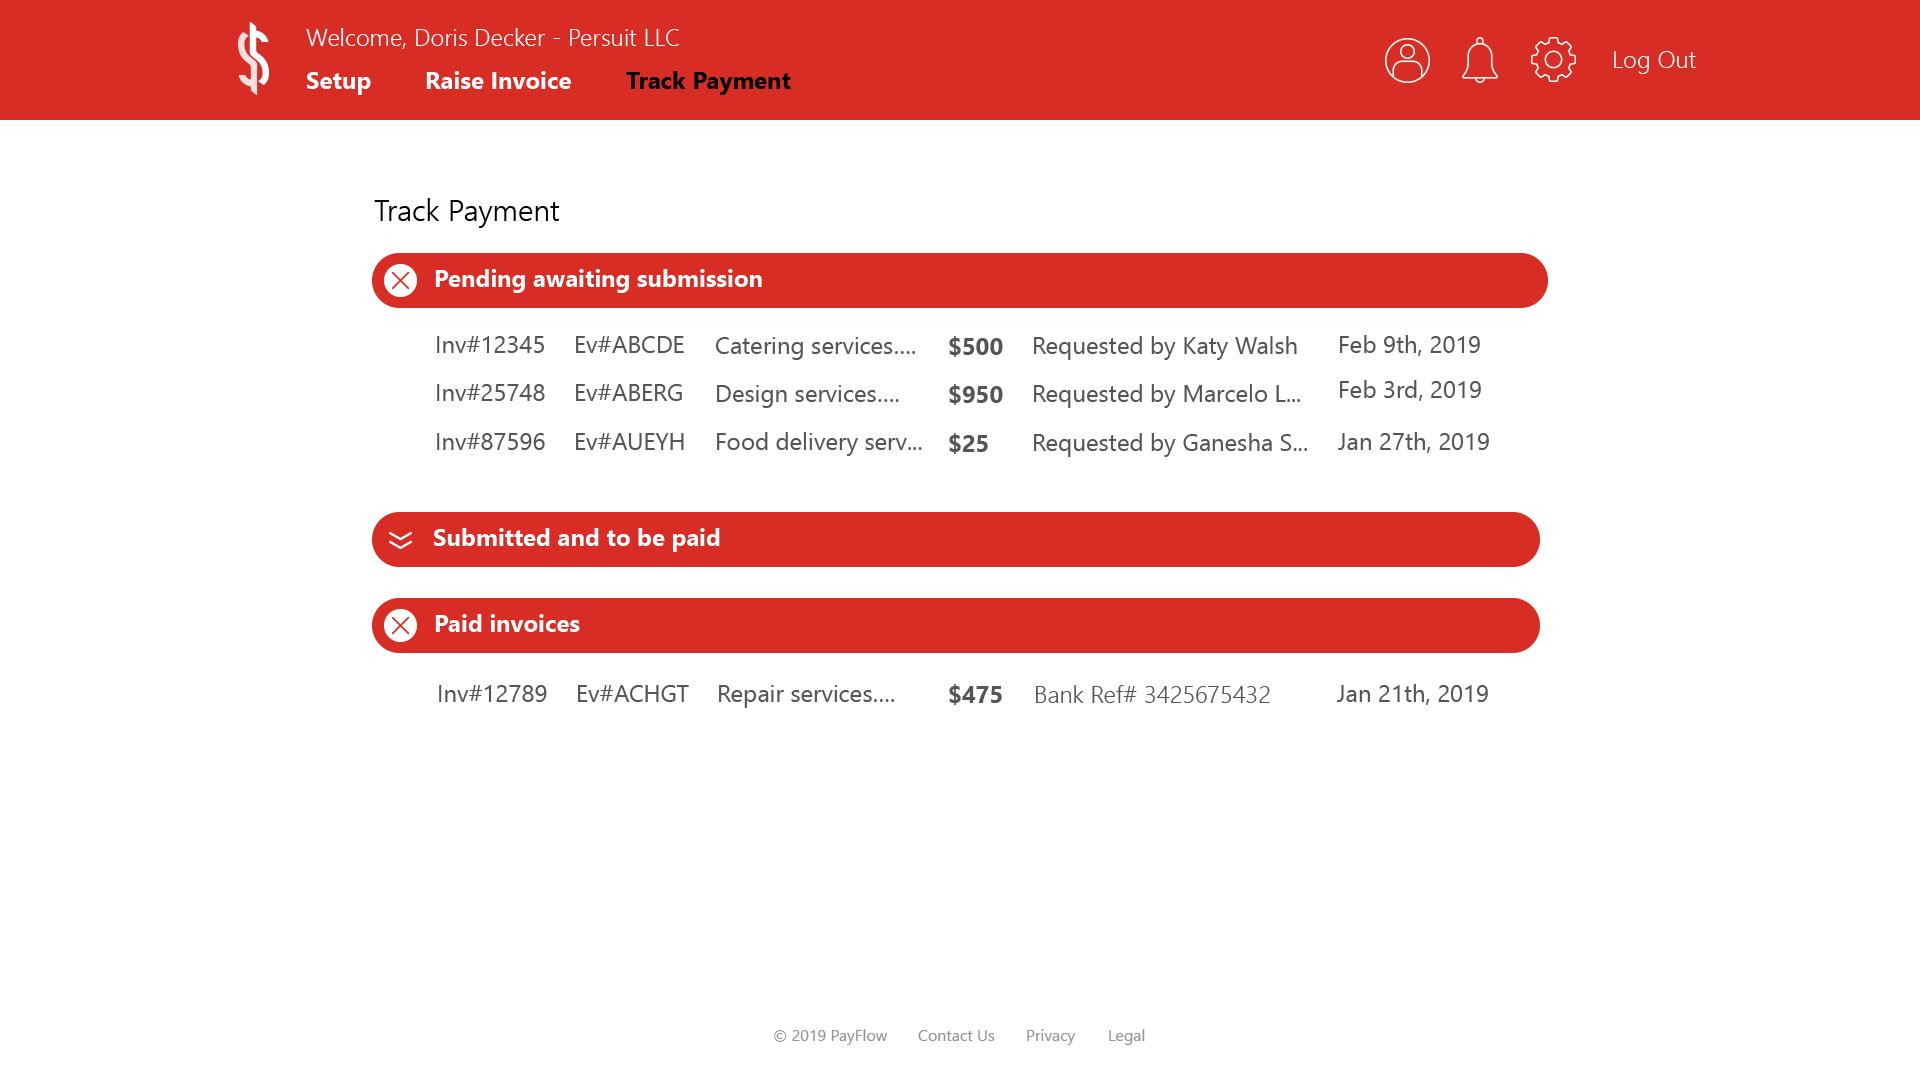 Vendor_TrackPayment